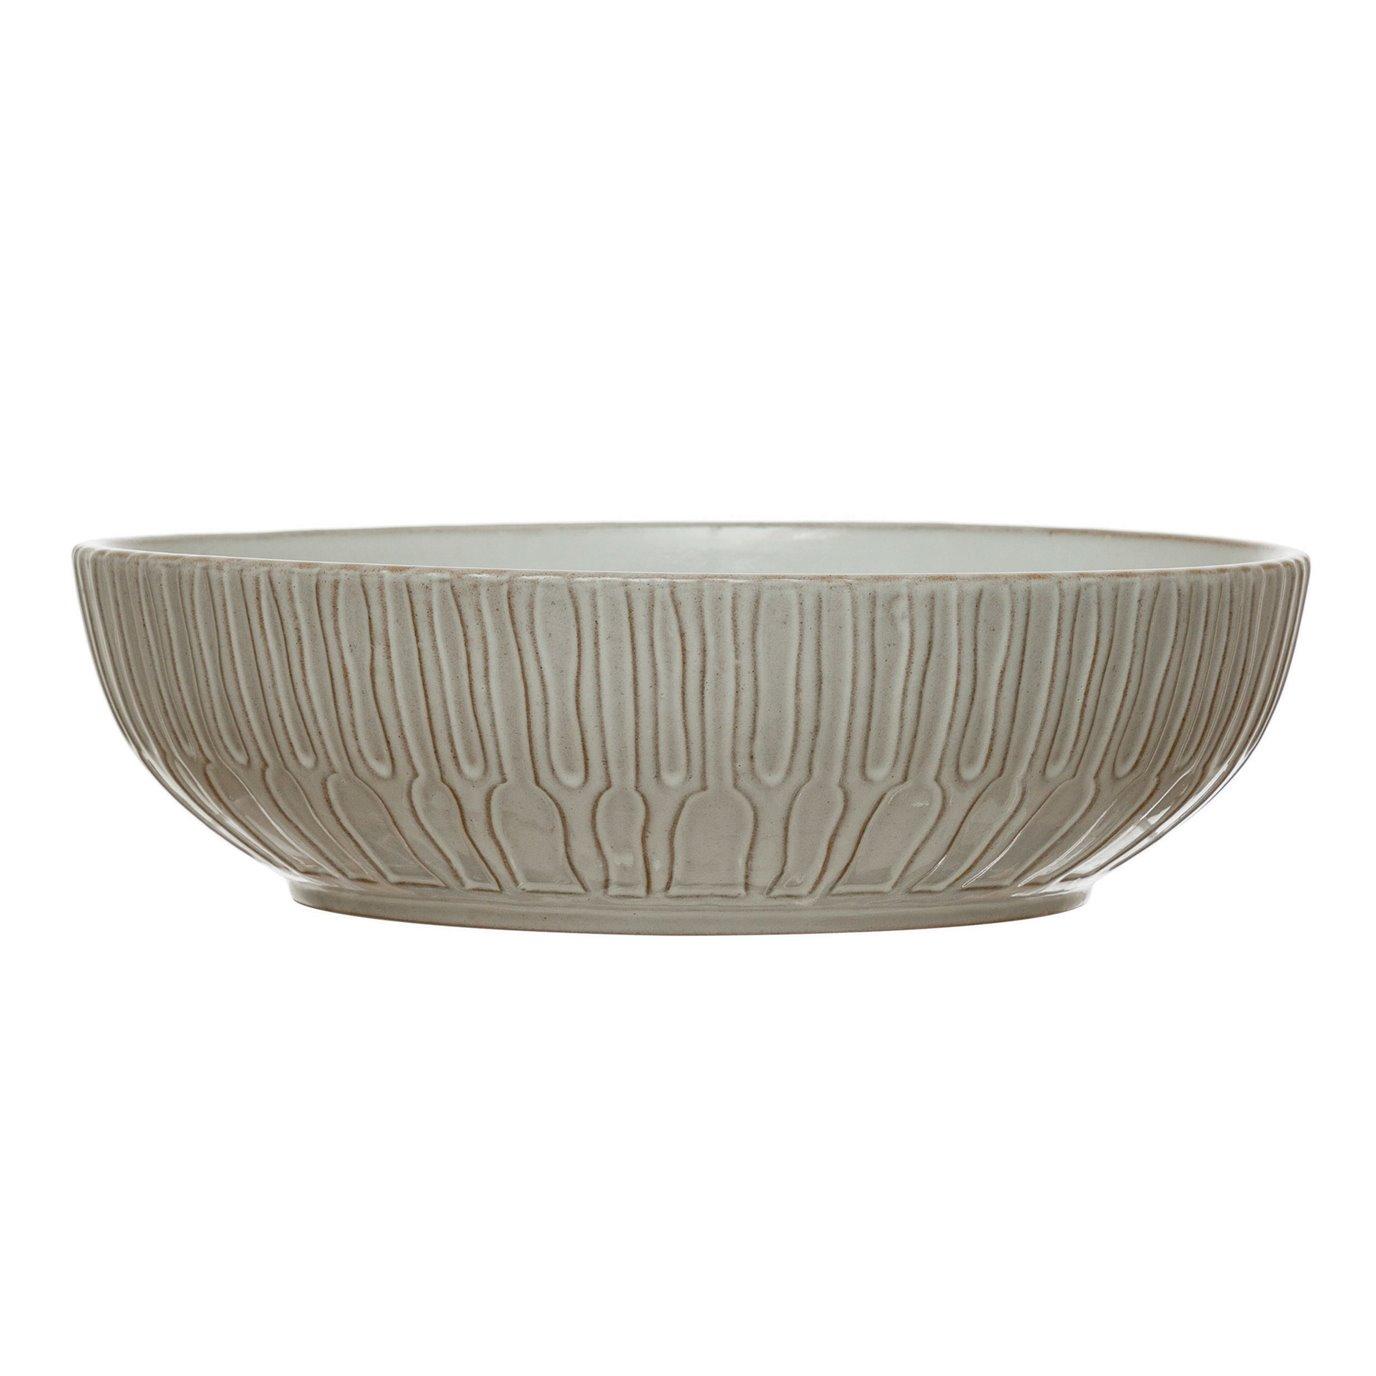 Debossed Stoneware Bowl, White